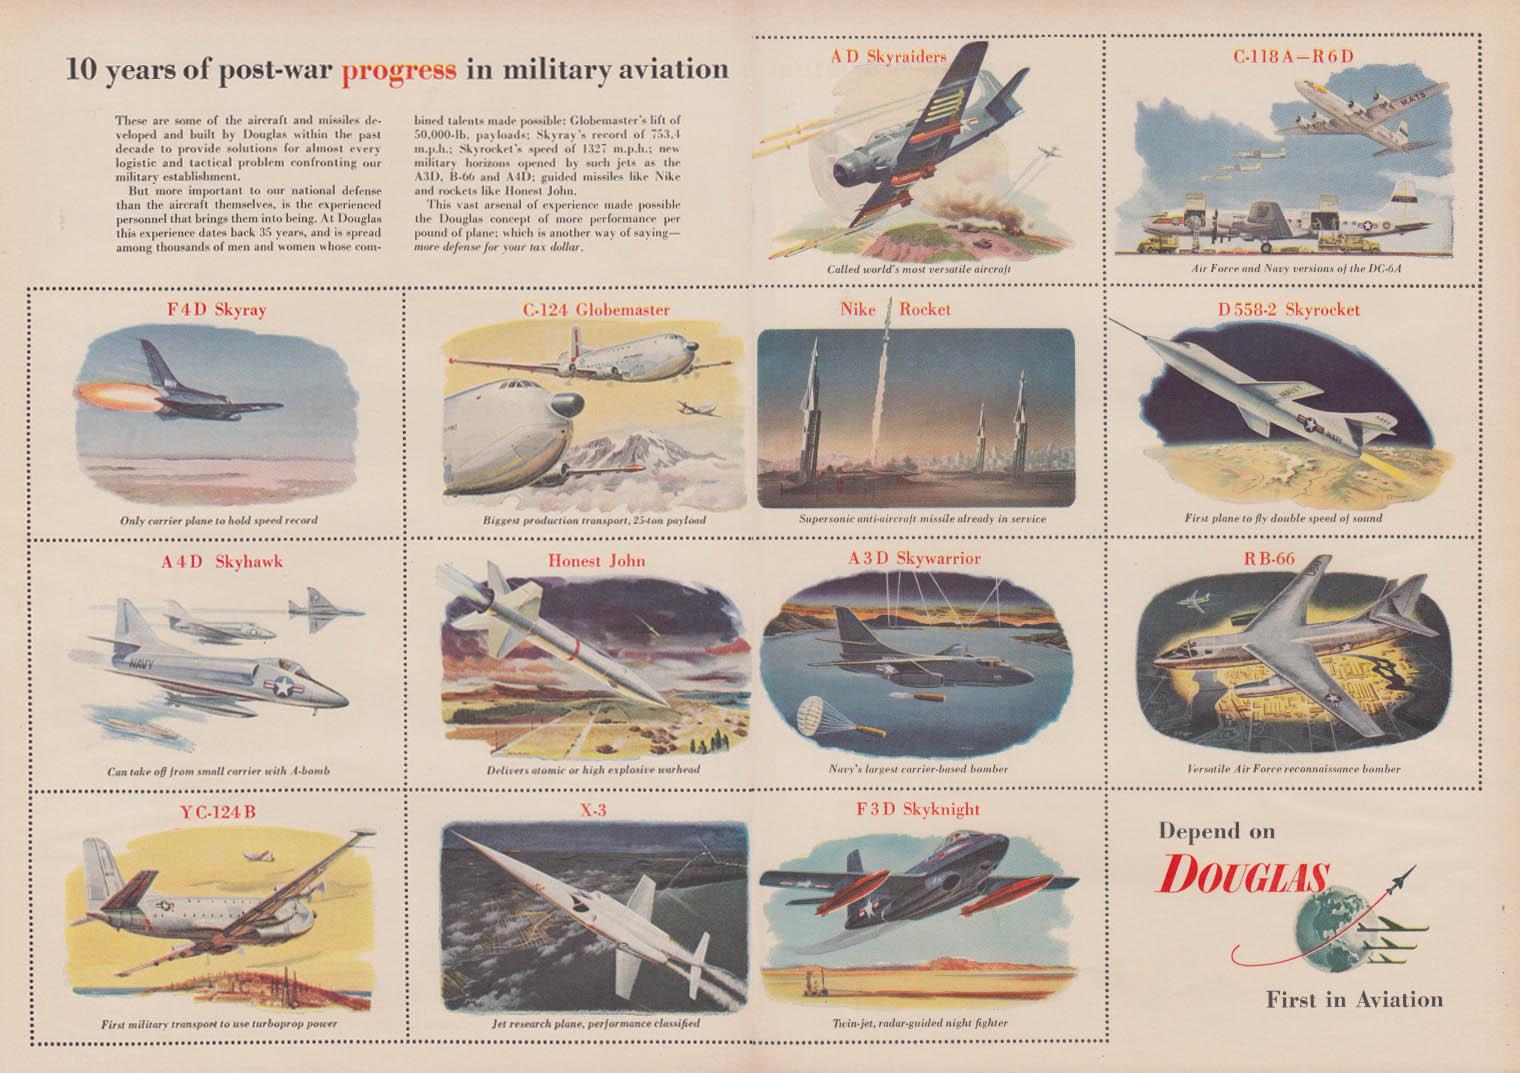 10 years of post-war progress in military aviation Douglas ad 1955